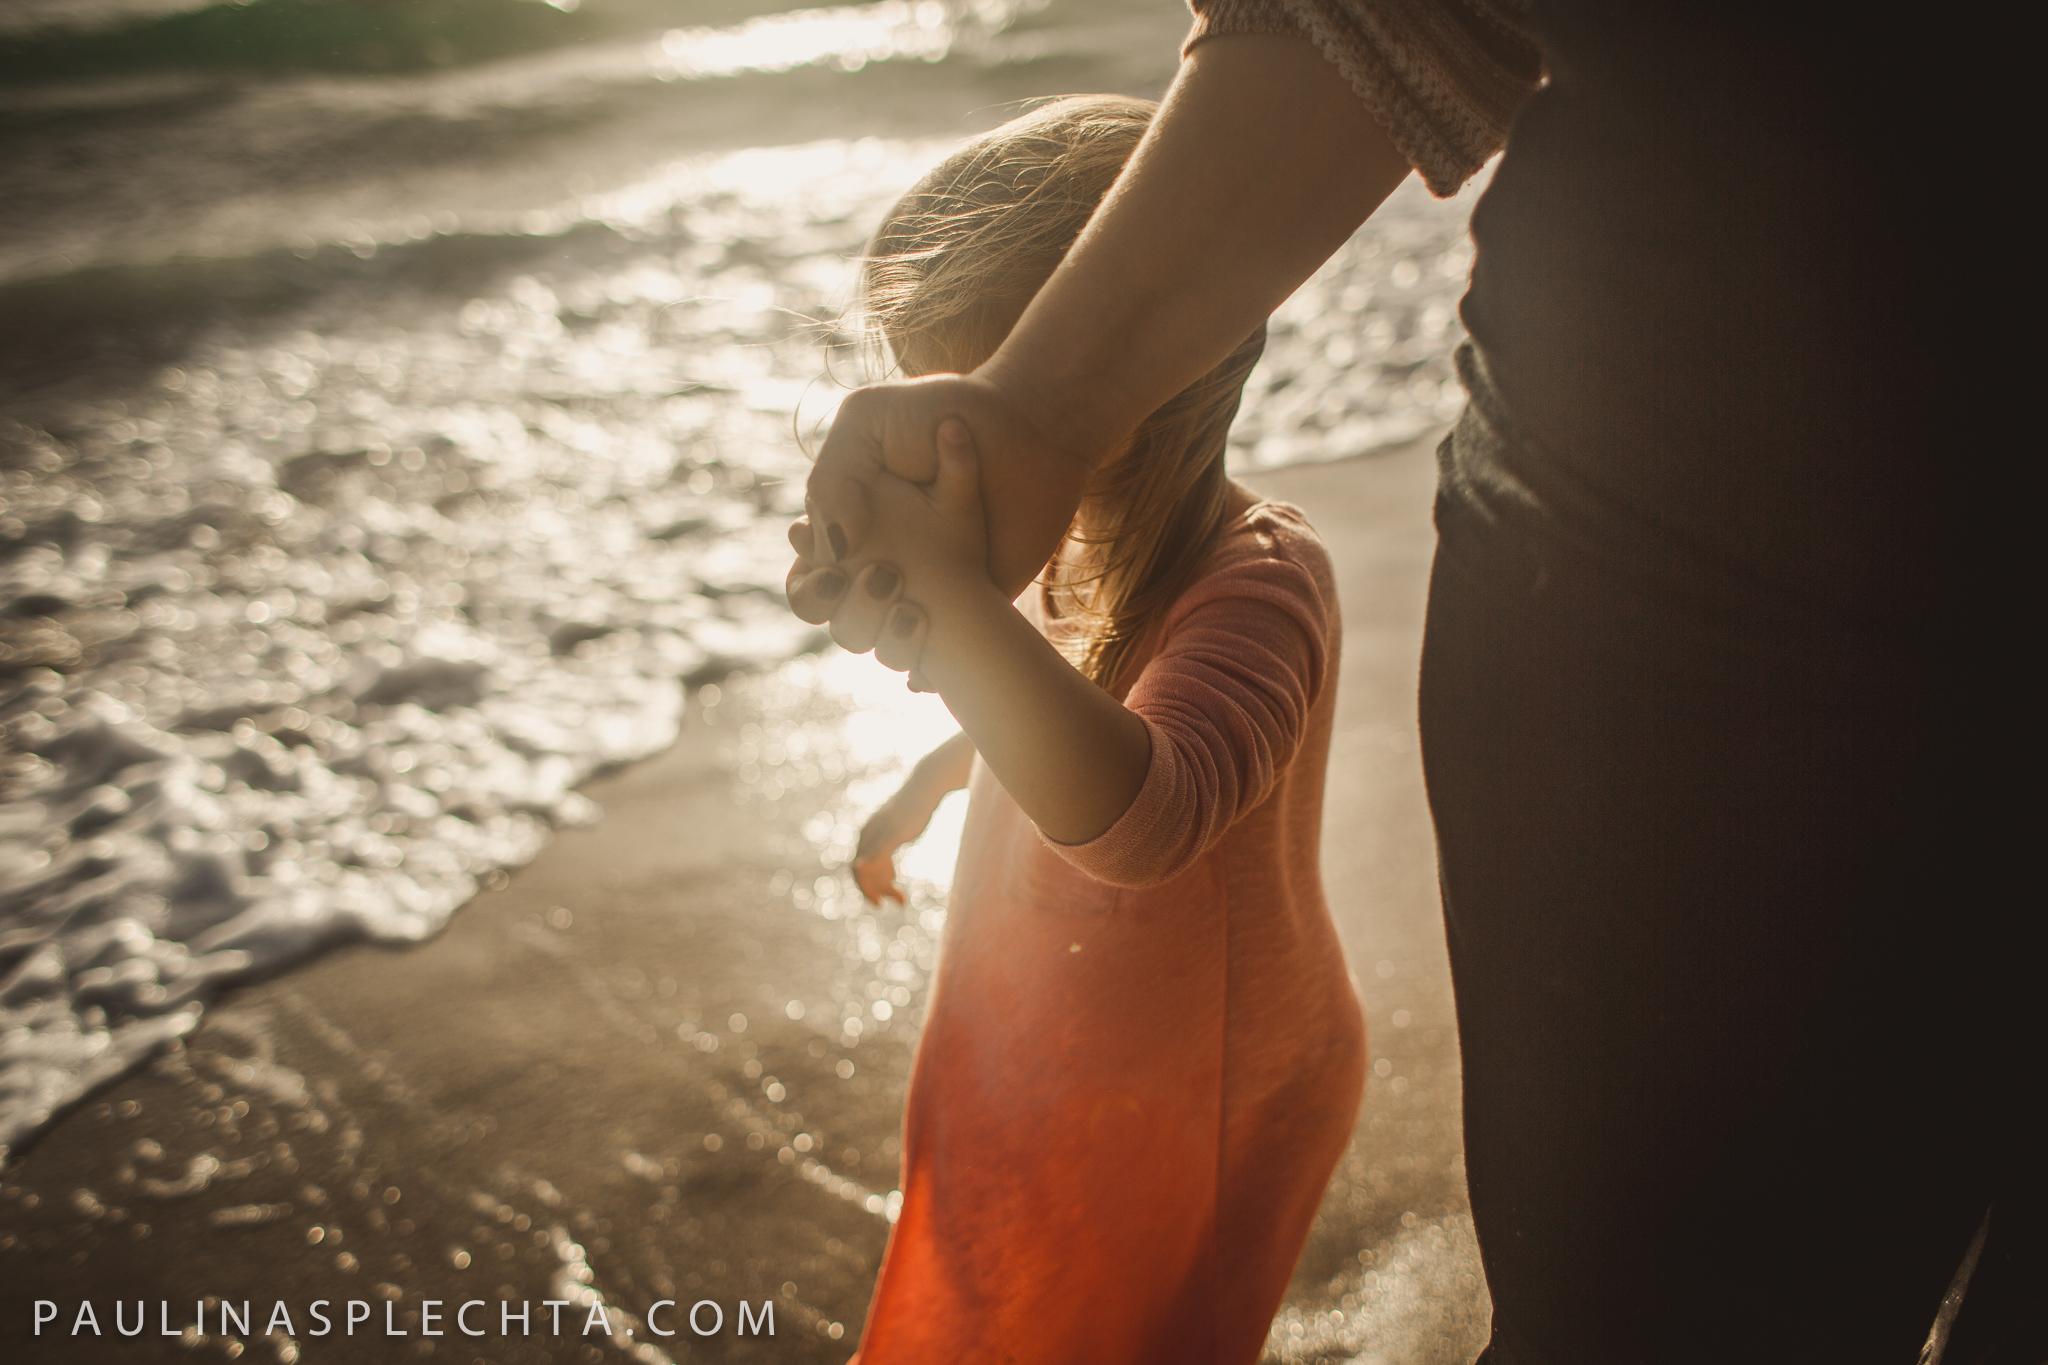 Family Photographer South Florida Pompano Broward Palm Beach Babies Baby Newborn Breastfeeding Birth Photograpy Beach Home Documentary Session-127.jpg